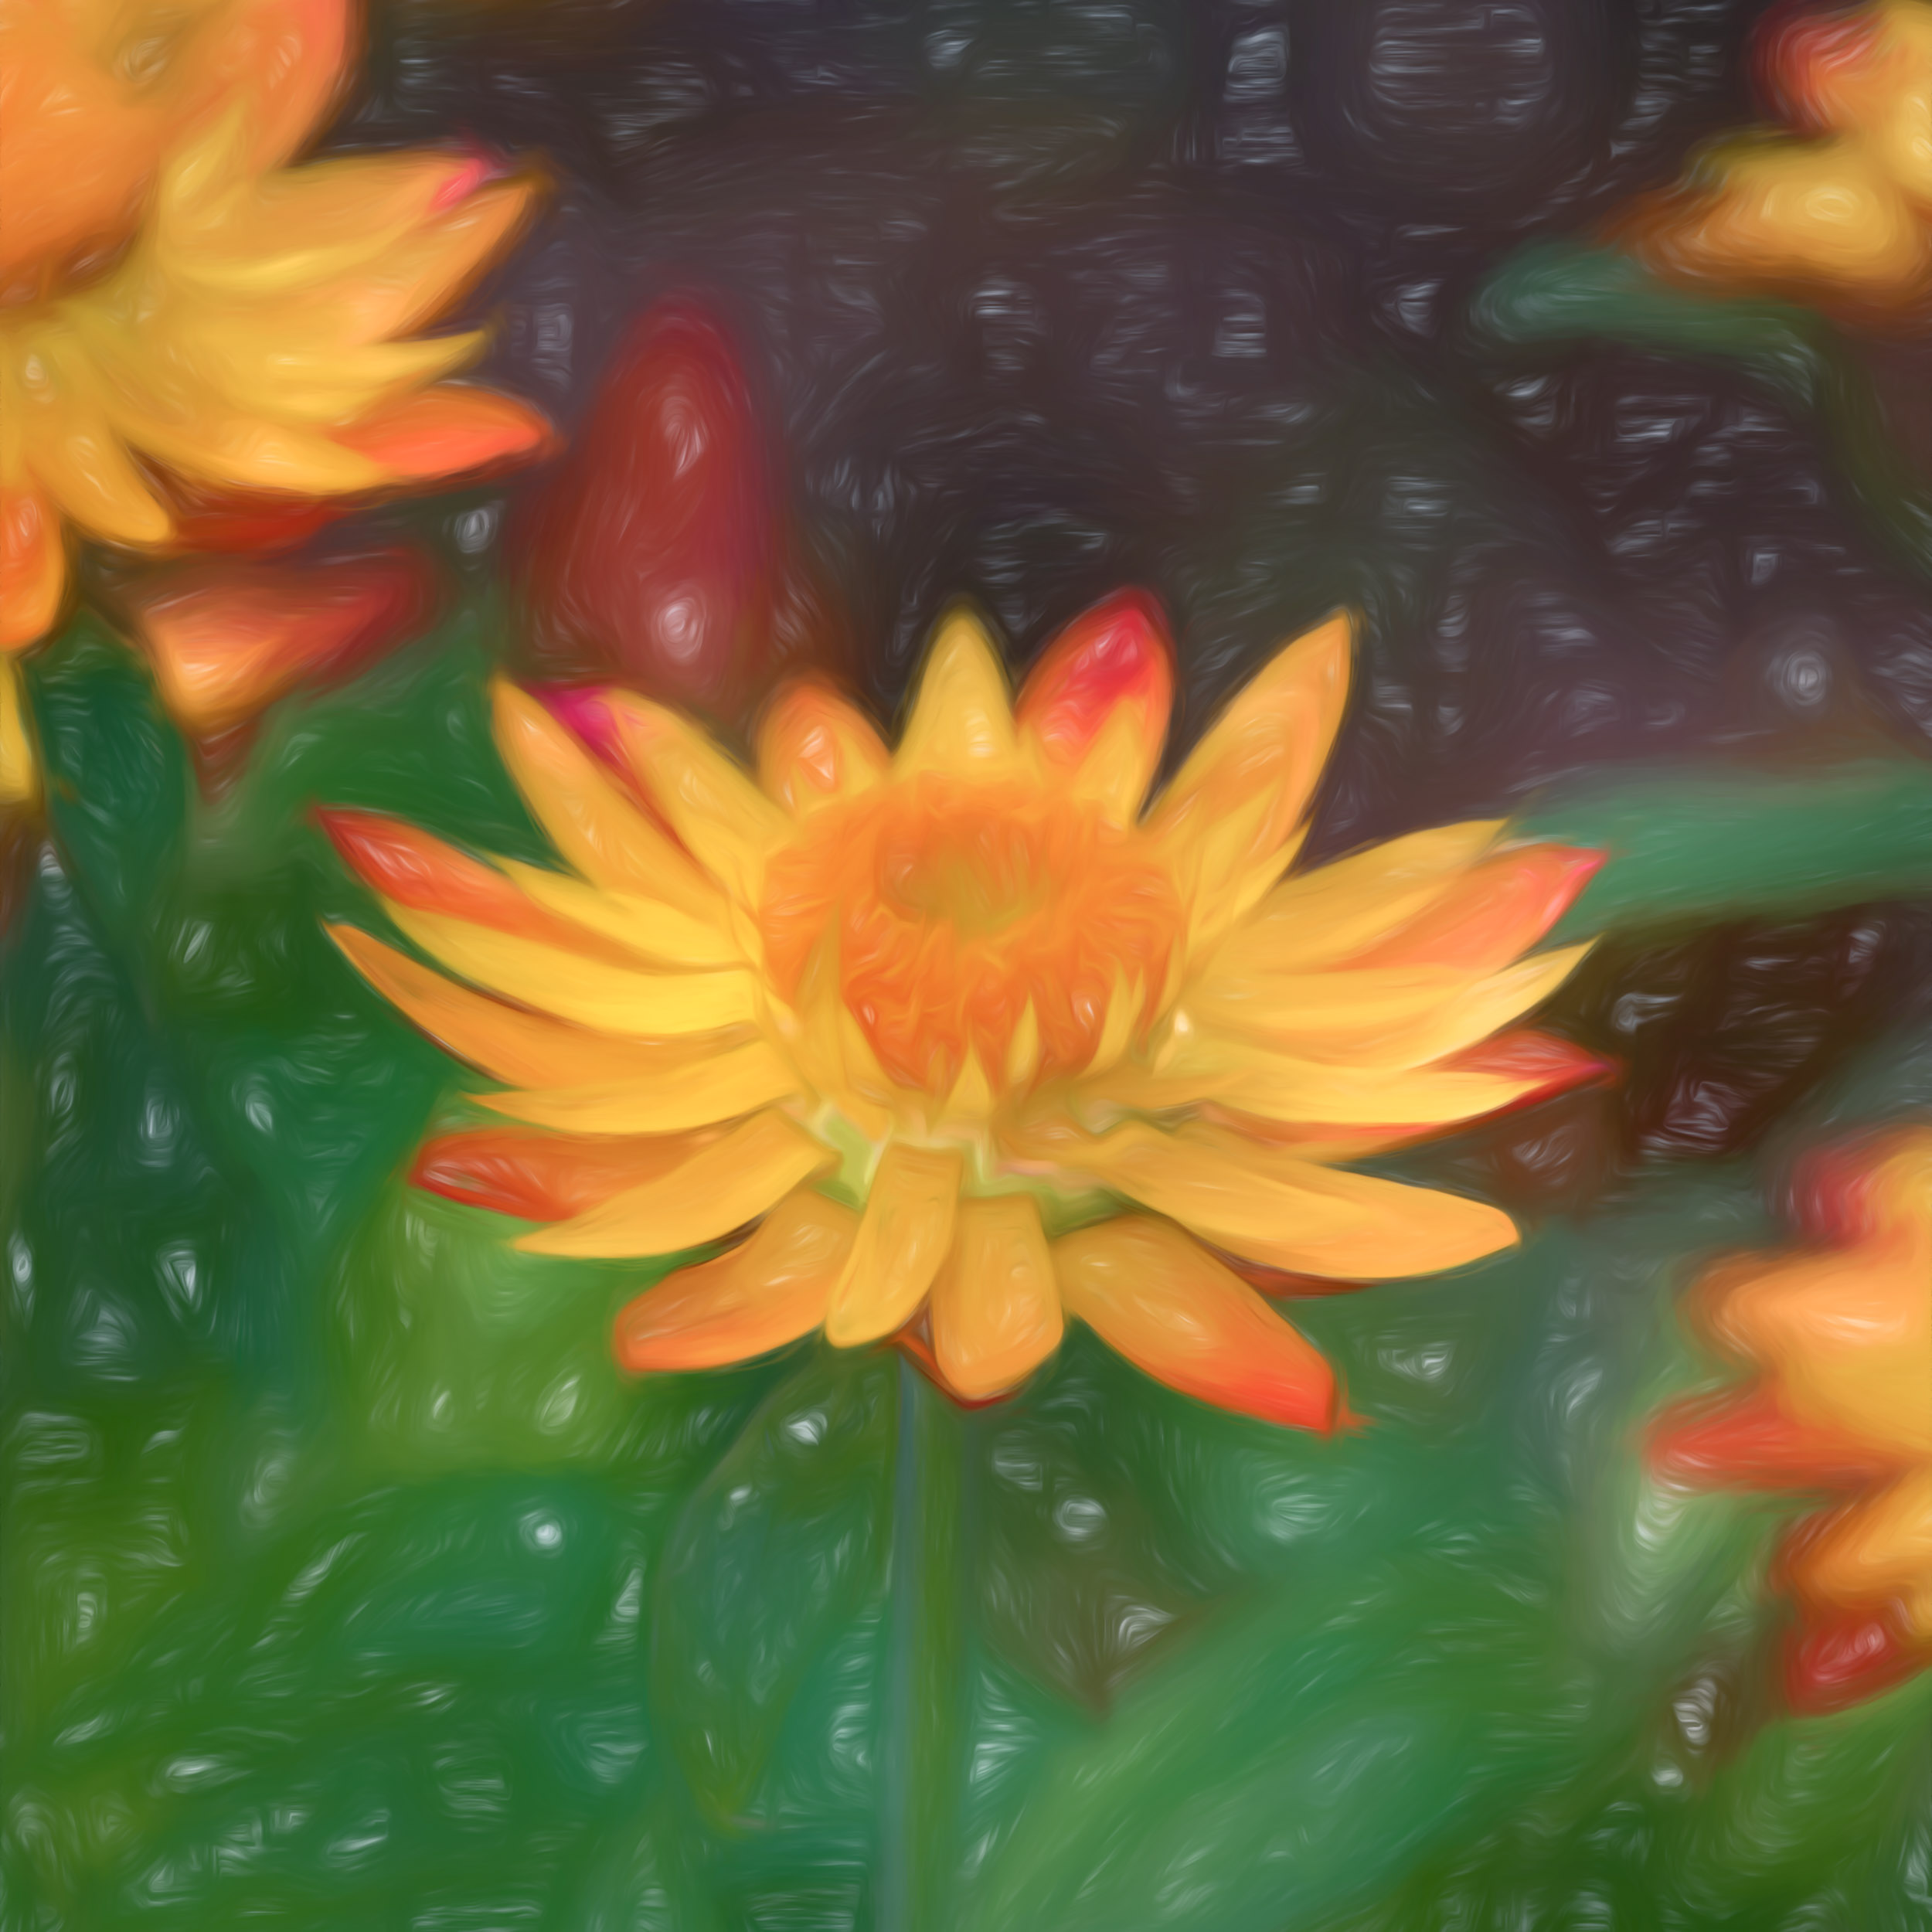 """Strawflower Squared"" - Photography Artist Kevin Sibbitt"